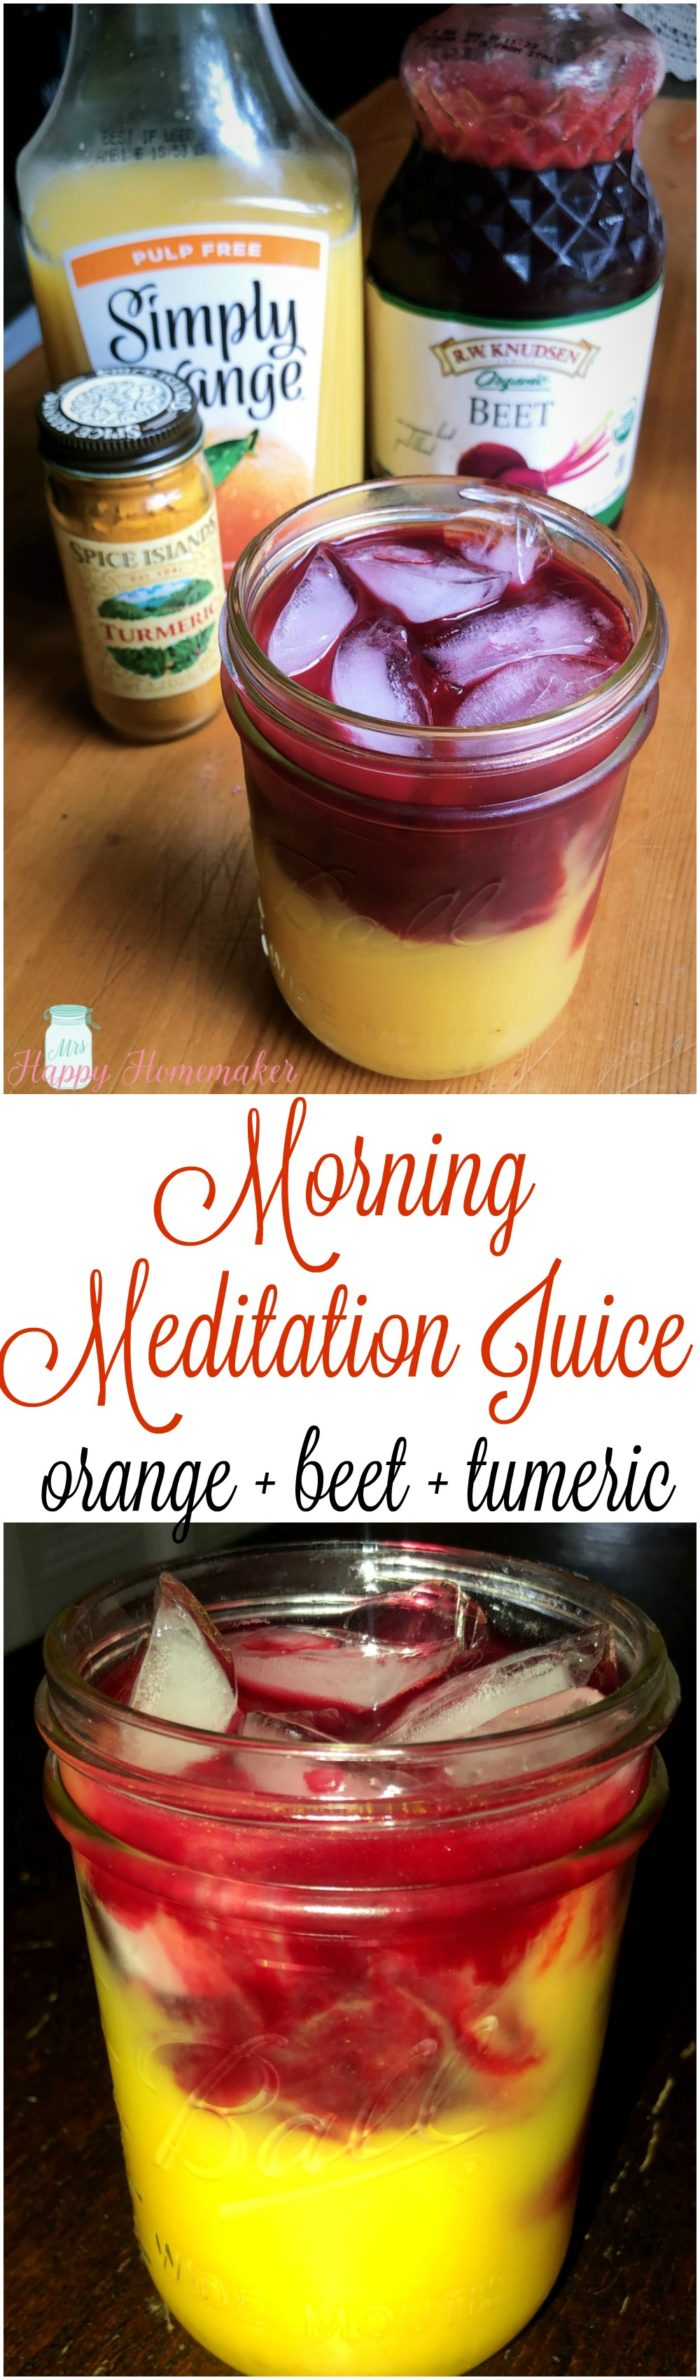 Morning Meditation Juice - orange, beet, turmeric | MrsHappyHomemaker.com @MrsHappyHomemaker